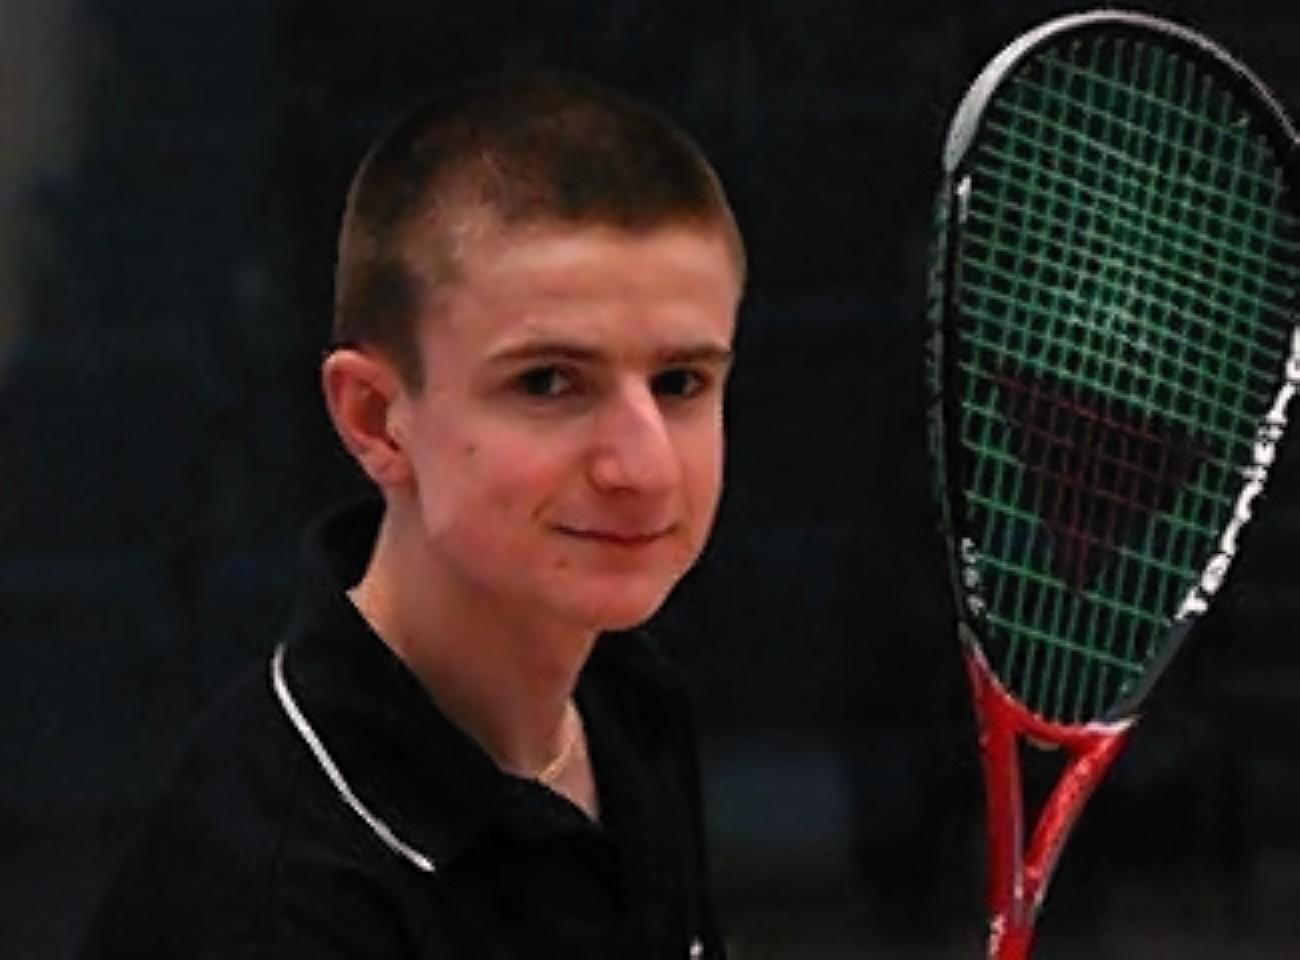 Inverness squash player Alan Clyne